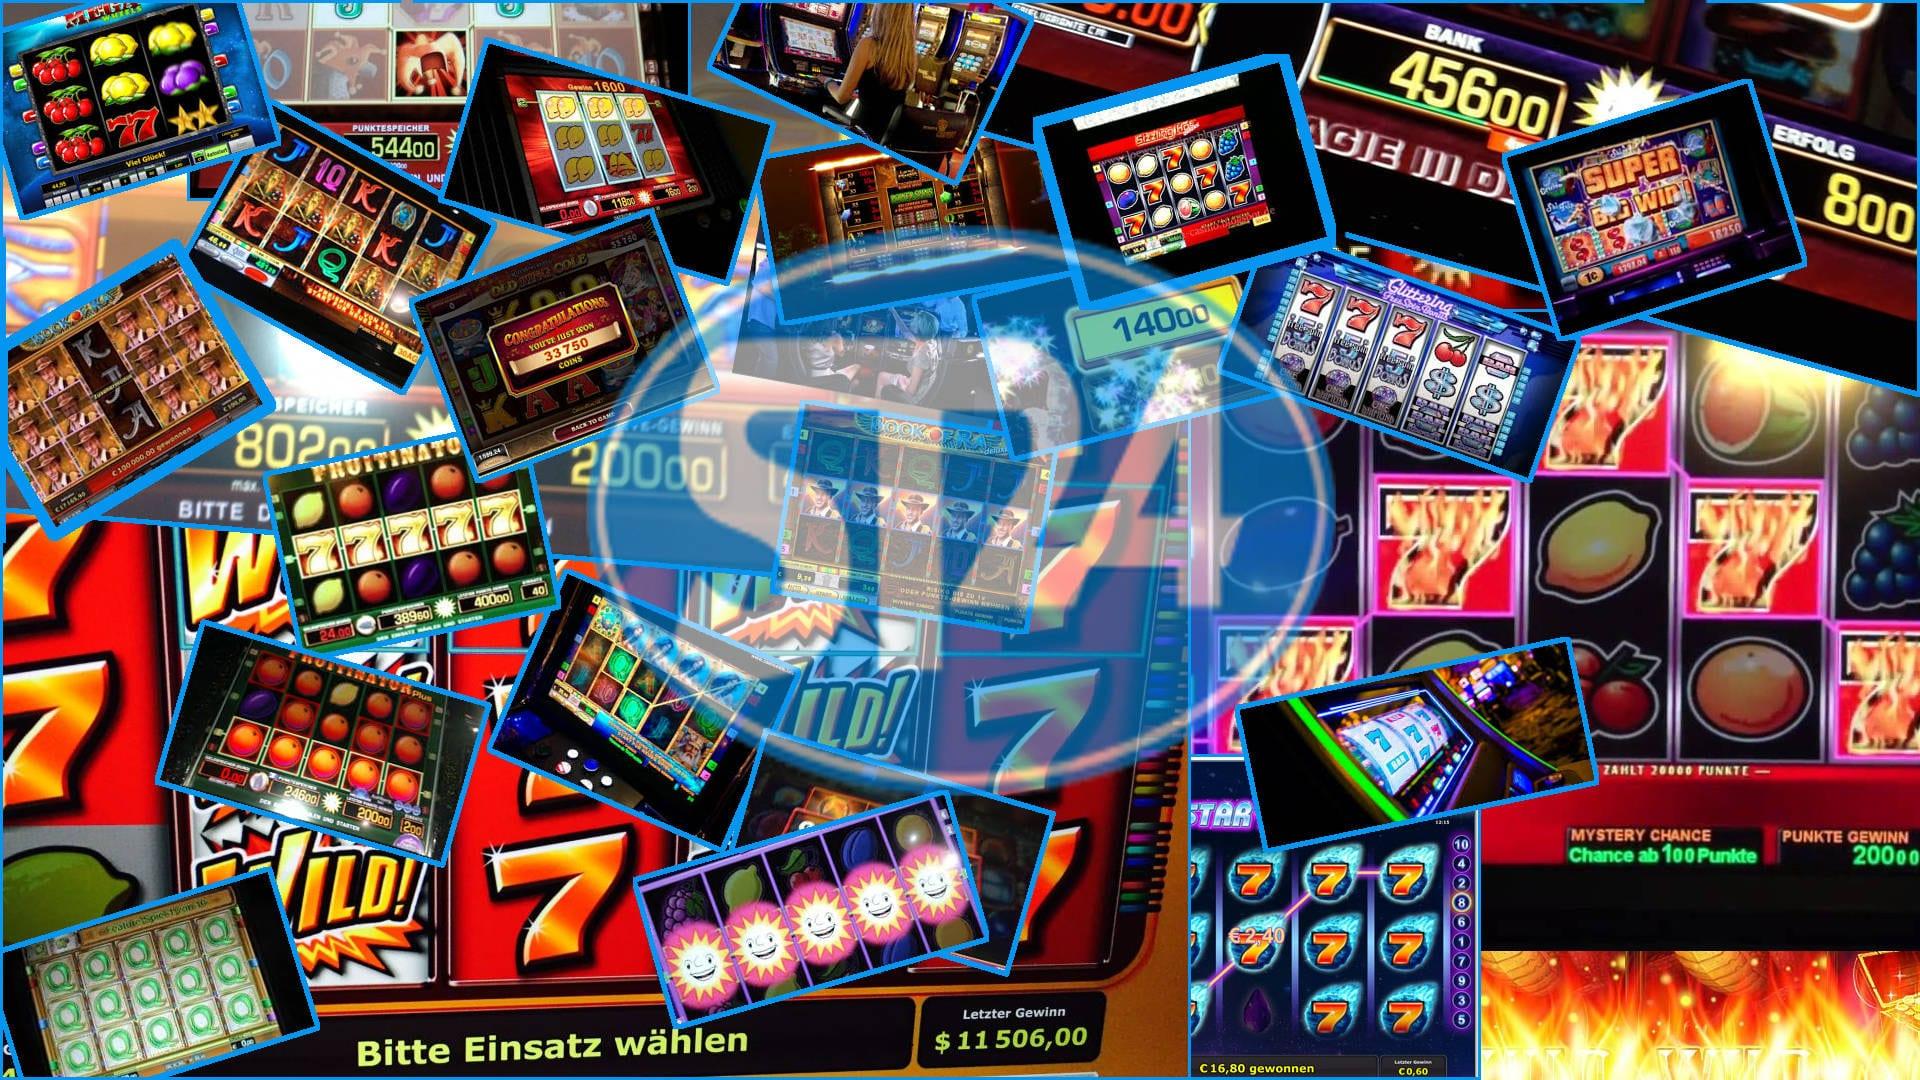 Spielautomaten Tricks App